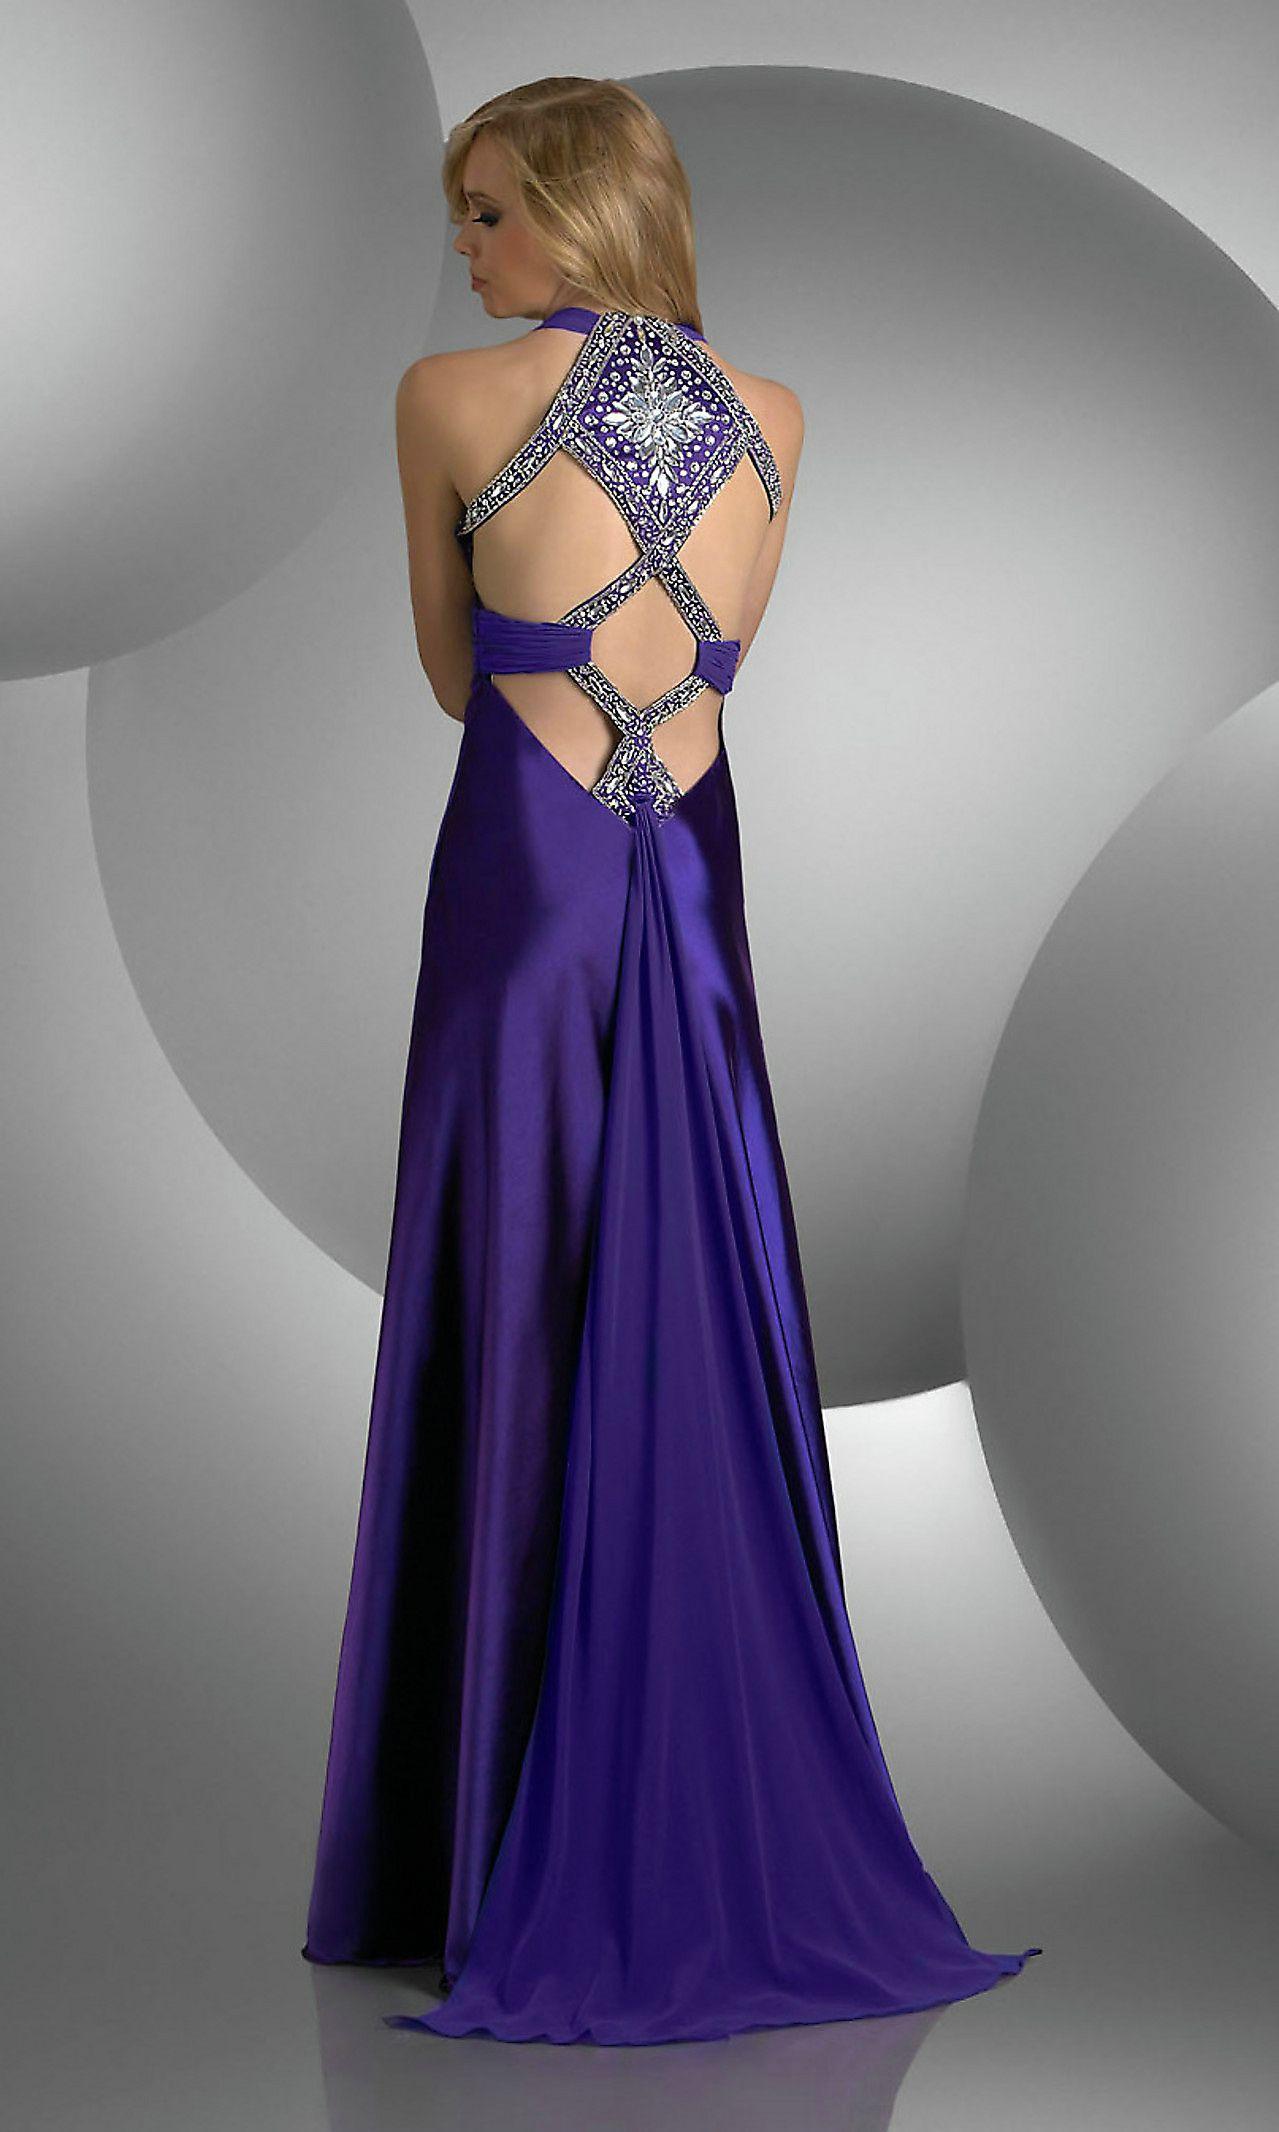 Pin by malejandra barros gübeli on the blues pinterest formal